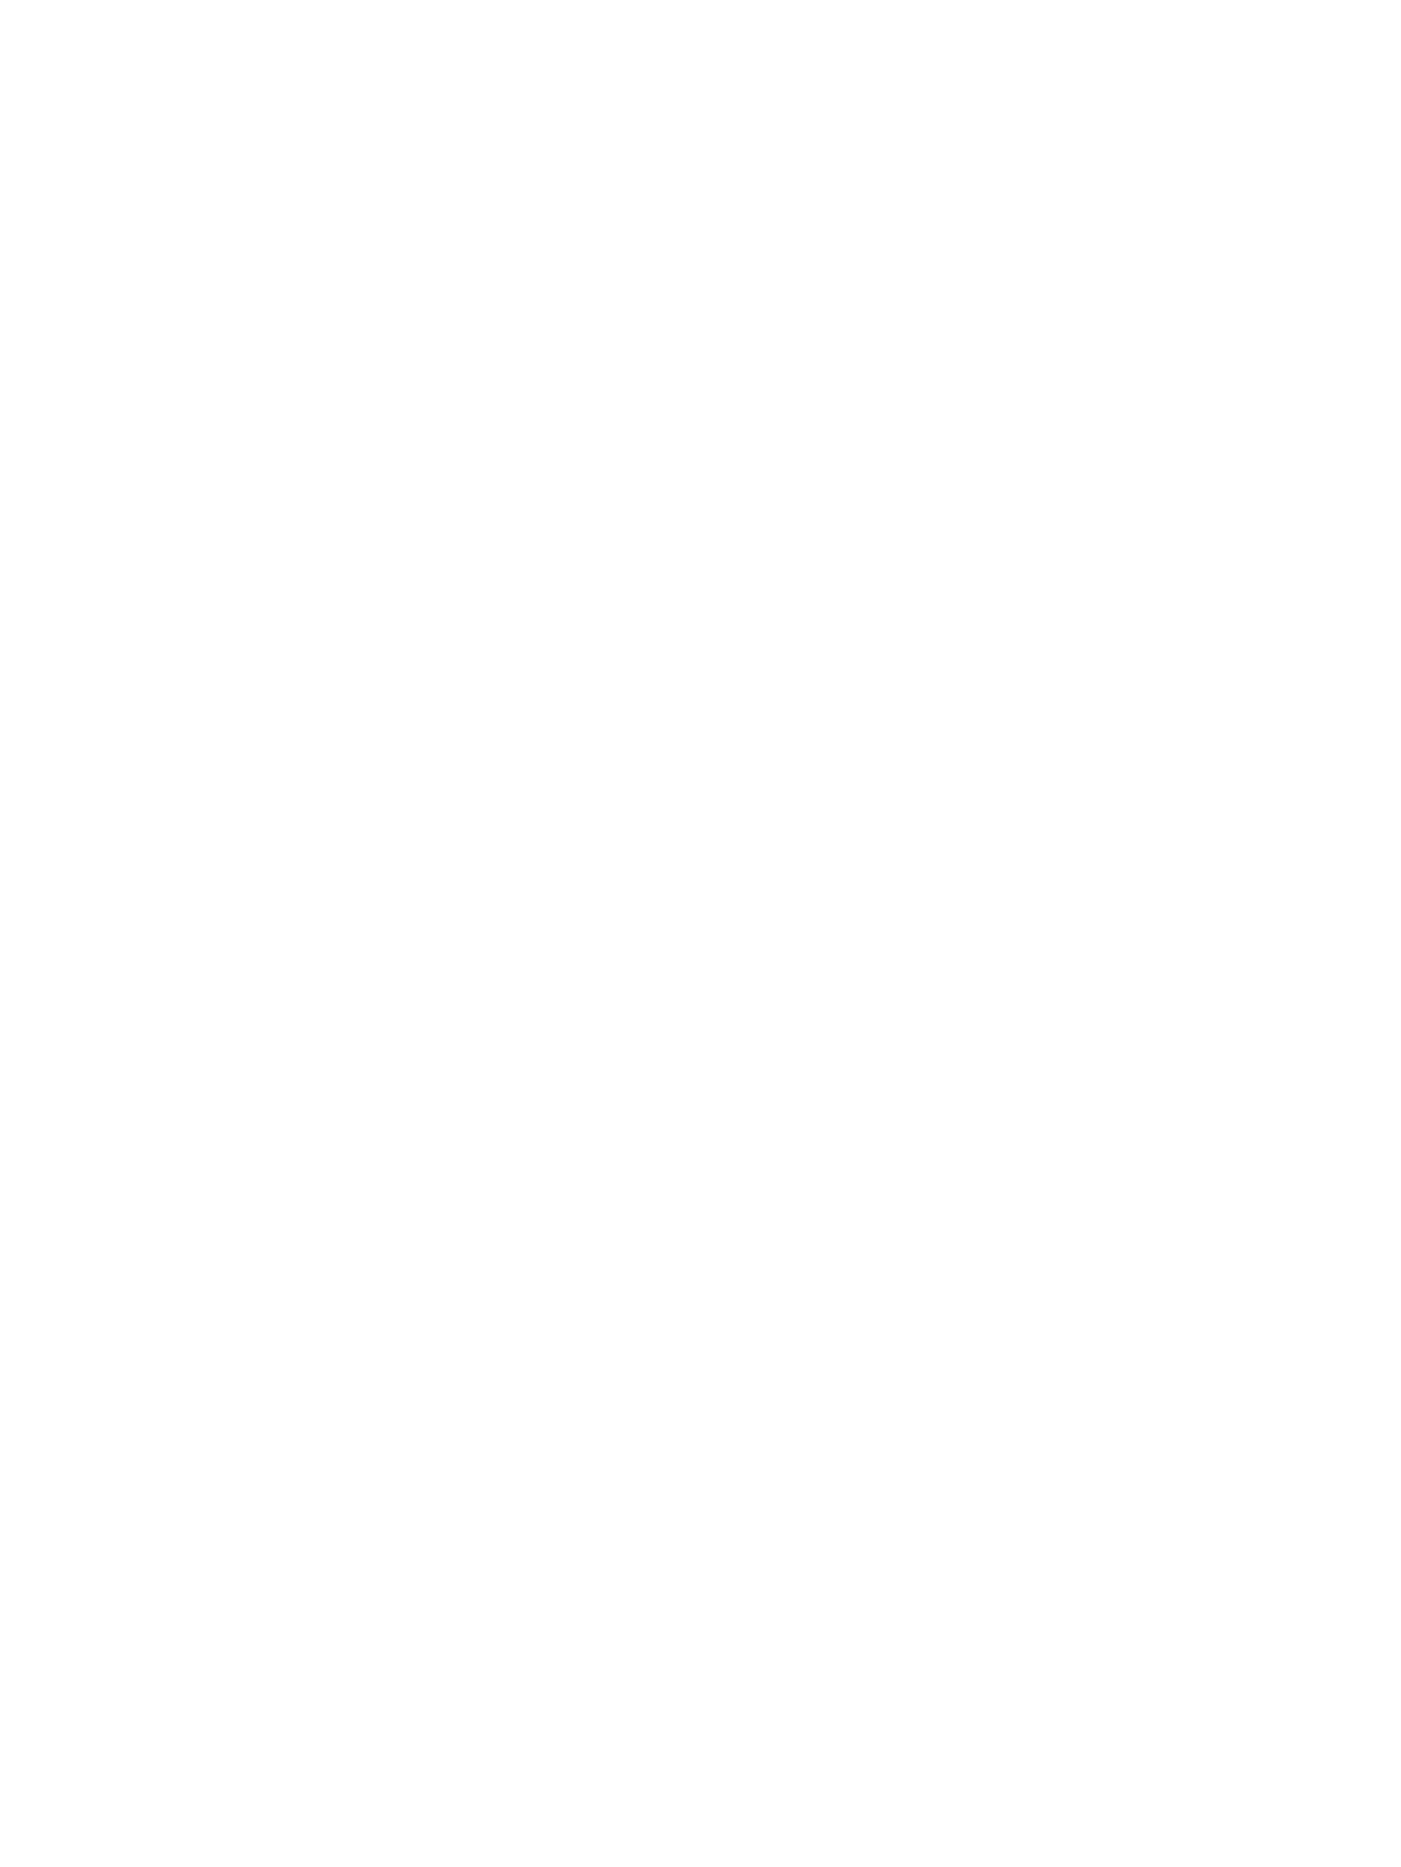 Трусы стринг vendetta londonБюстье<br>трусы<br><br>Цвет: Голубой<br>Декор: None<br>Стилистика: None<br>Направление: Бюстье<br>Пол: Женский<br>Материал: 64%ПА; 22%ЭЛ; 14%ХЛ<br>Размер RU: 46